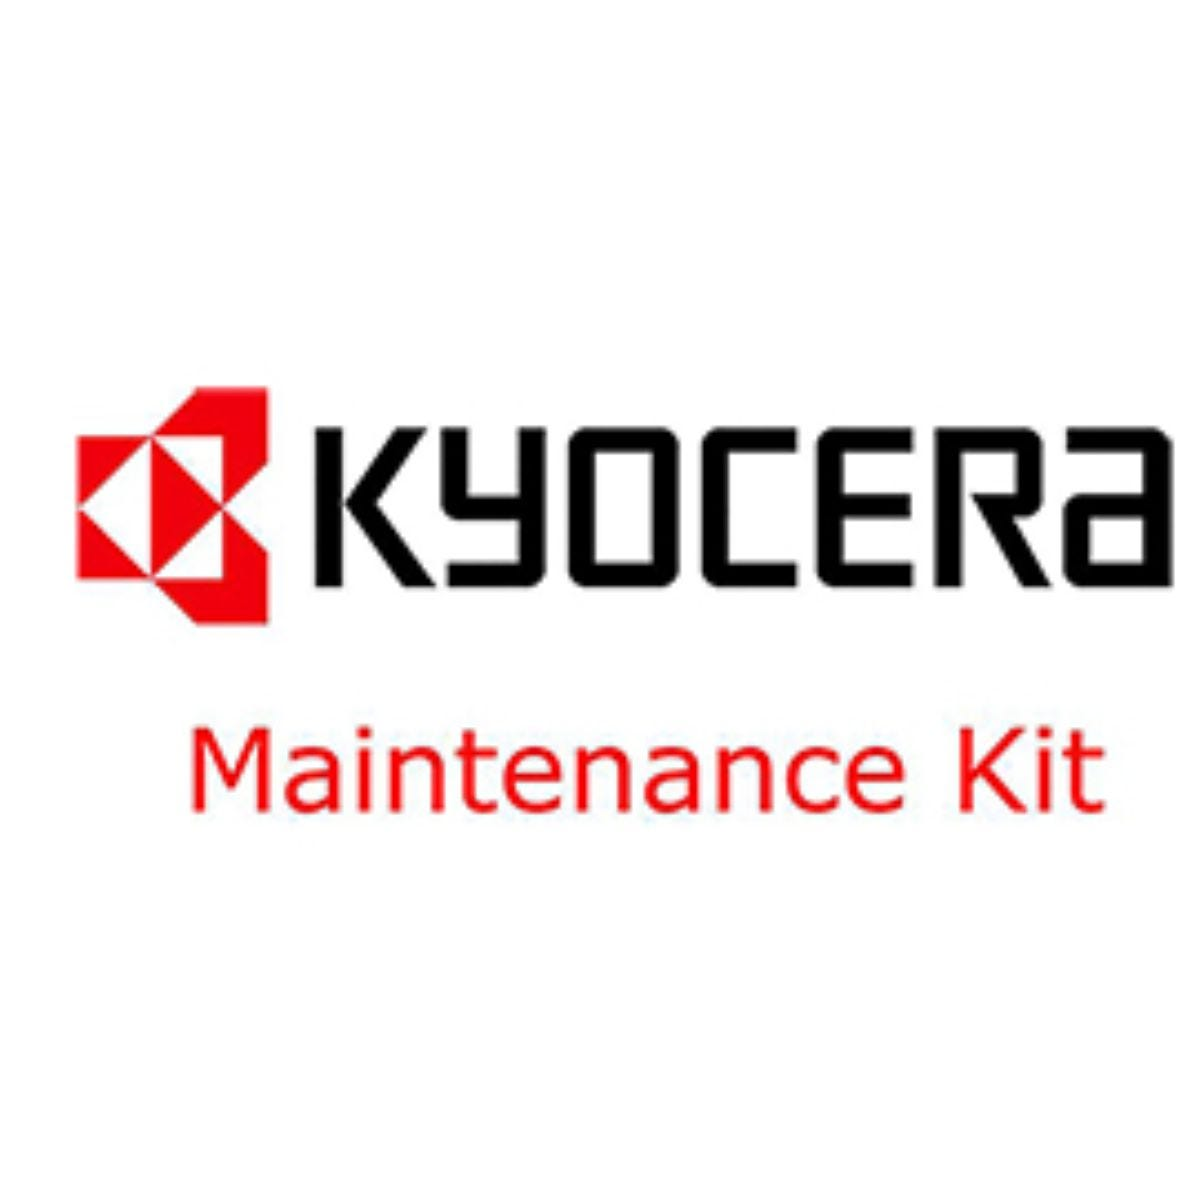 Image of Kyocera MK-340 Maintenance Kit